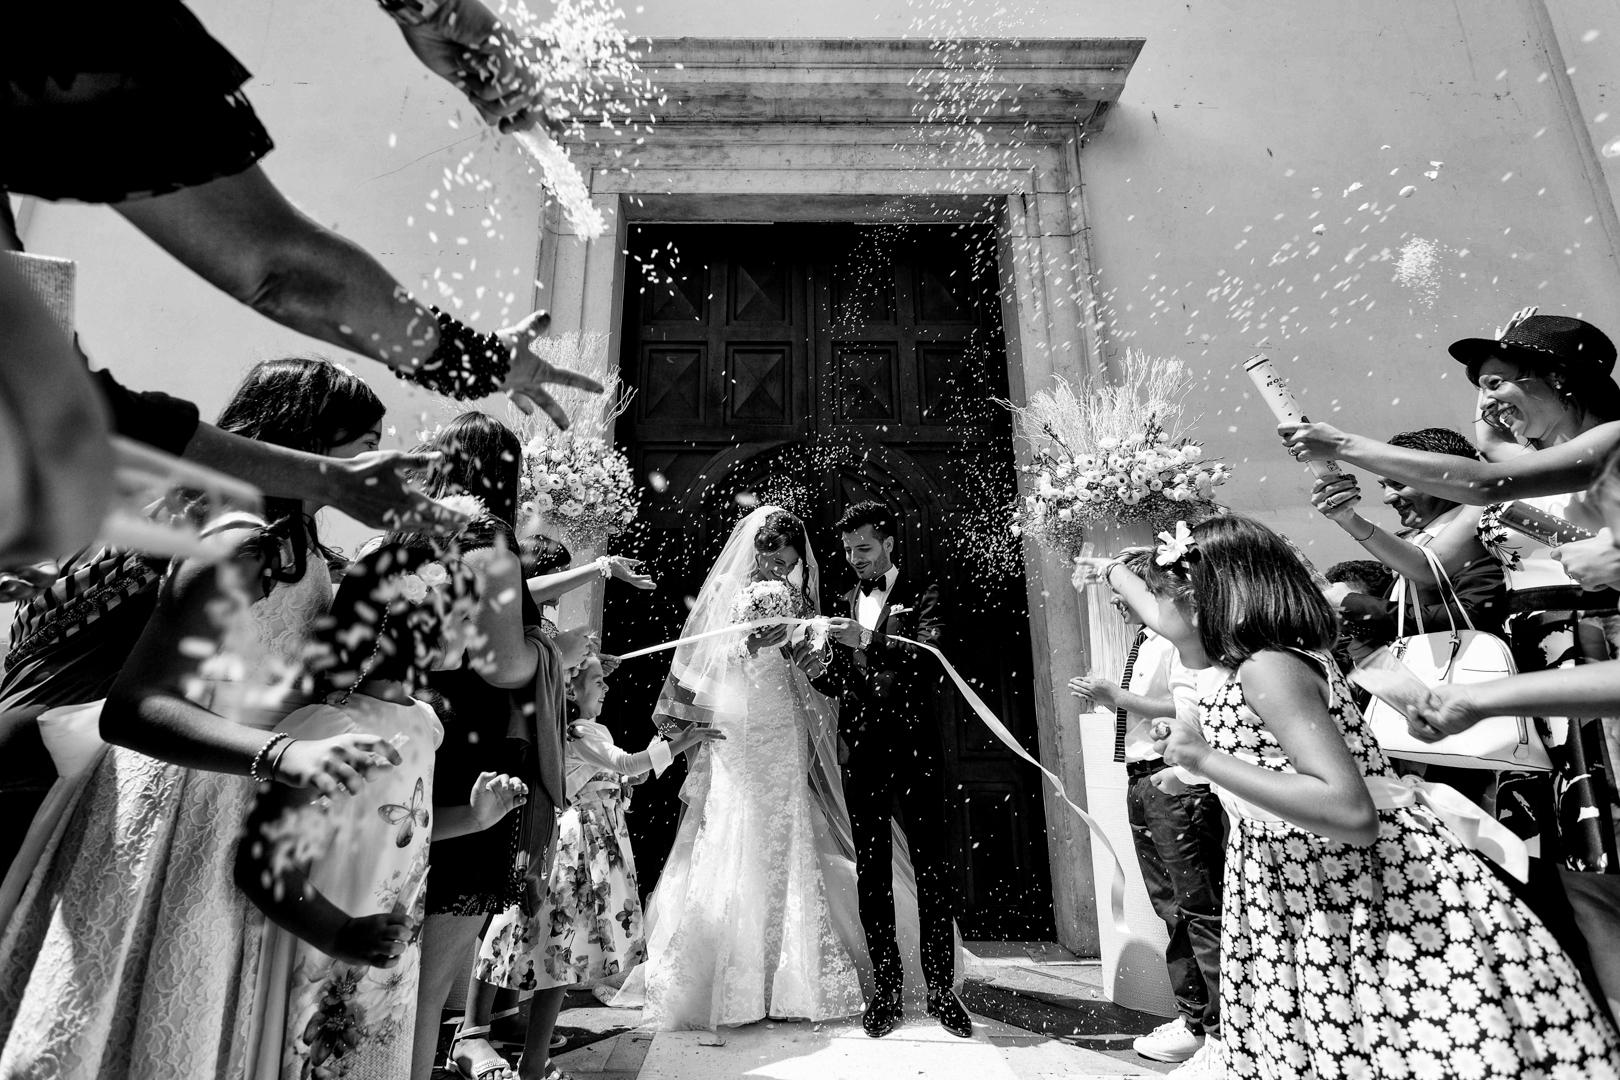 19 gianni-lepore-lancio-riso-sposi